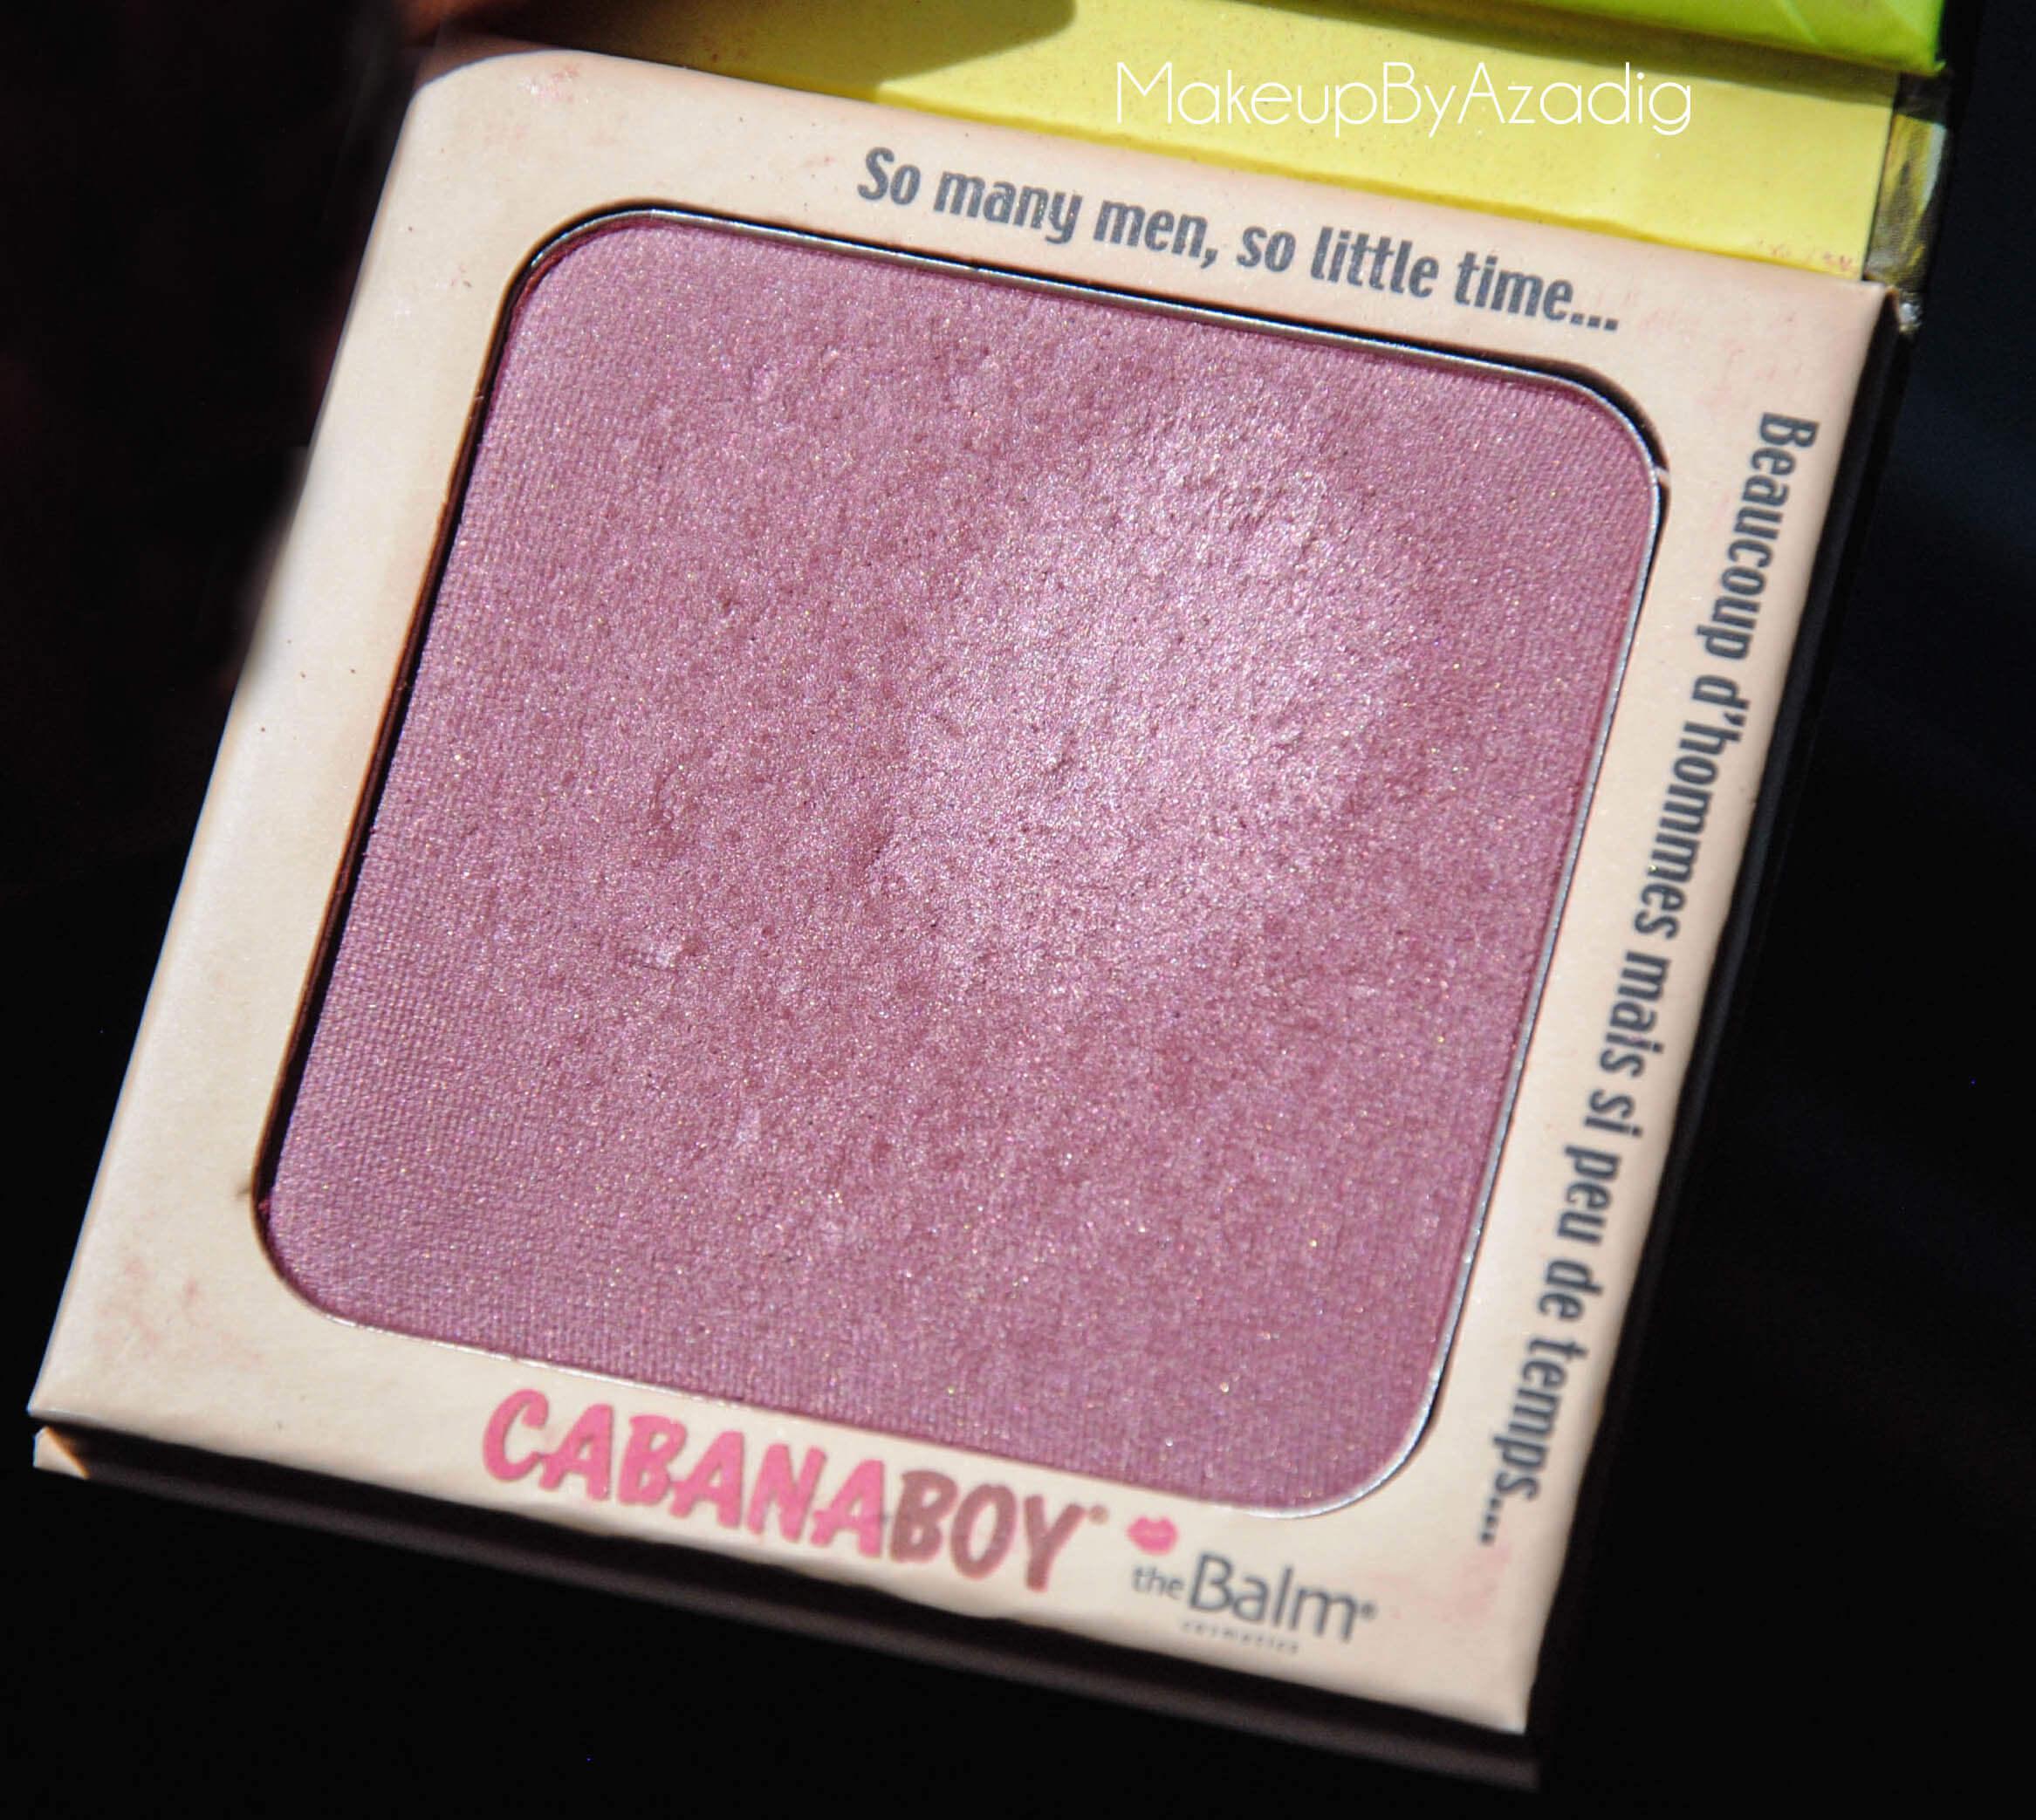 cabanaboy-the balm-blush rose fonce-monoprix-beaute privee-the beautyst-makeupbyazadig-sun